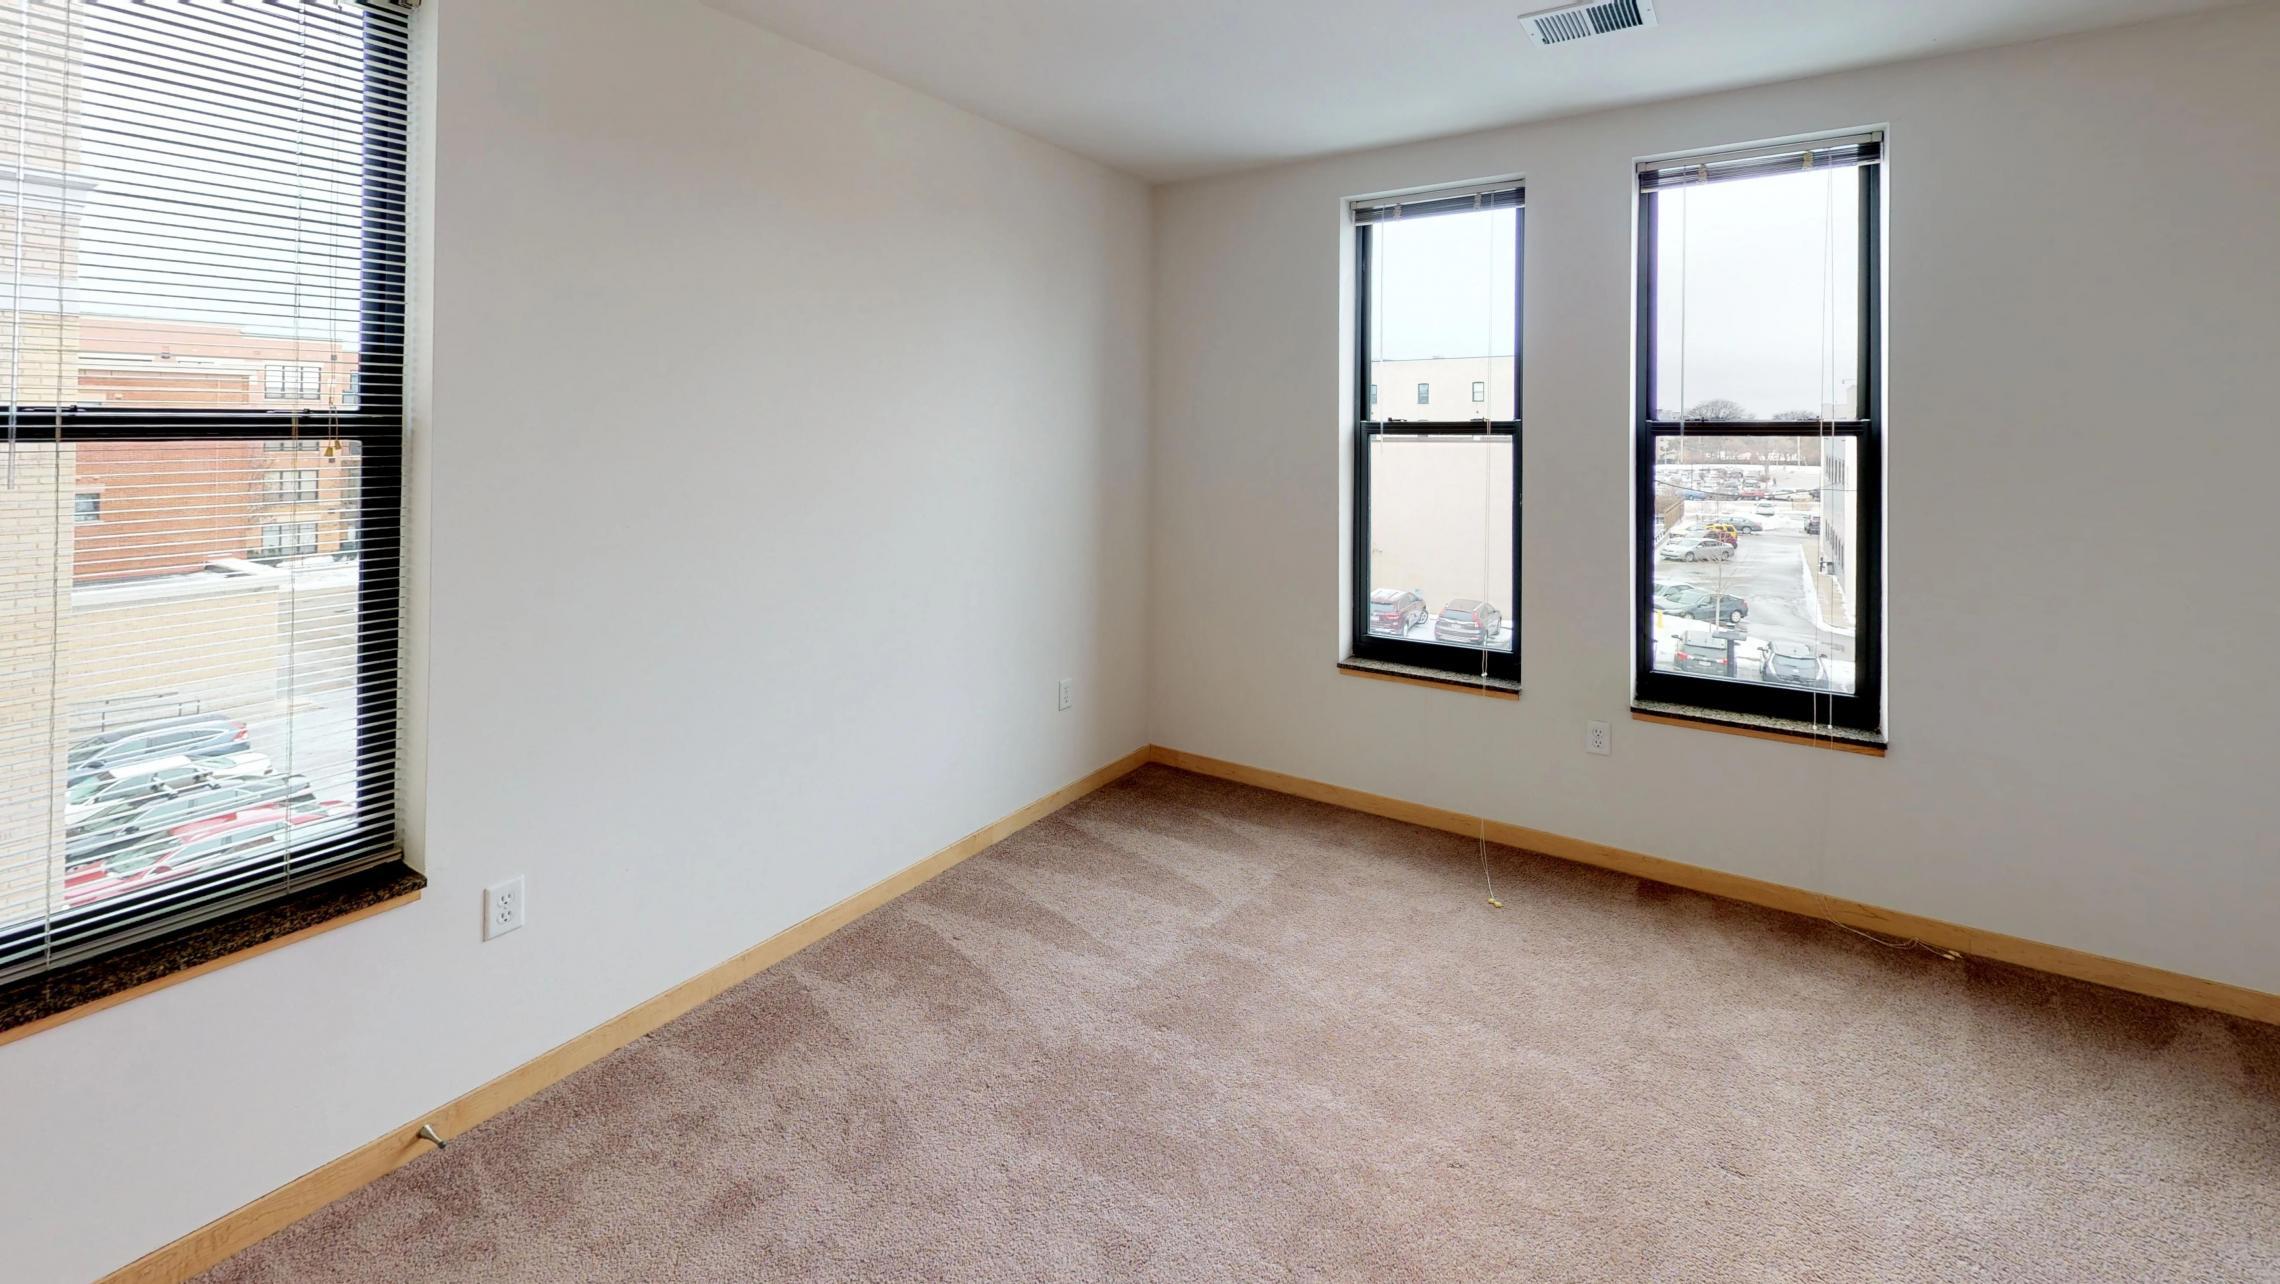 The-Depot-Apartments-Downtown-Madison-Lifestyle-Large-Closet-Bike-Storage-Washington-Ave-Style-Design-Balcony-Apartment-1-316-One-Bedroom-Den